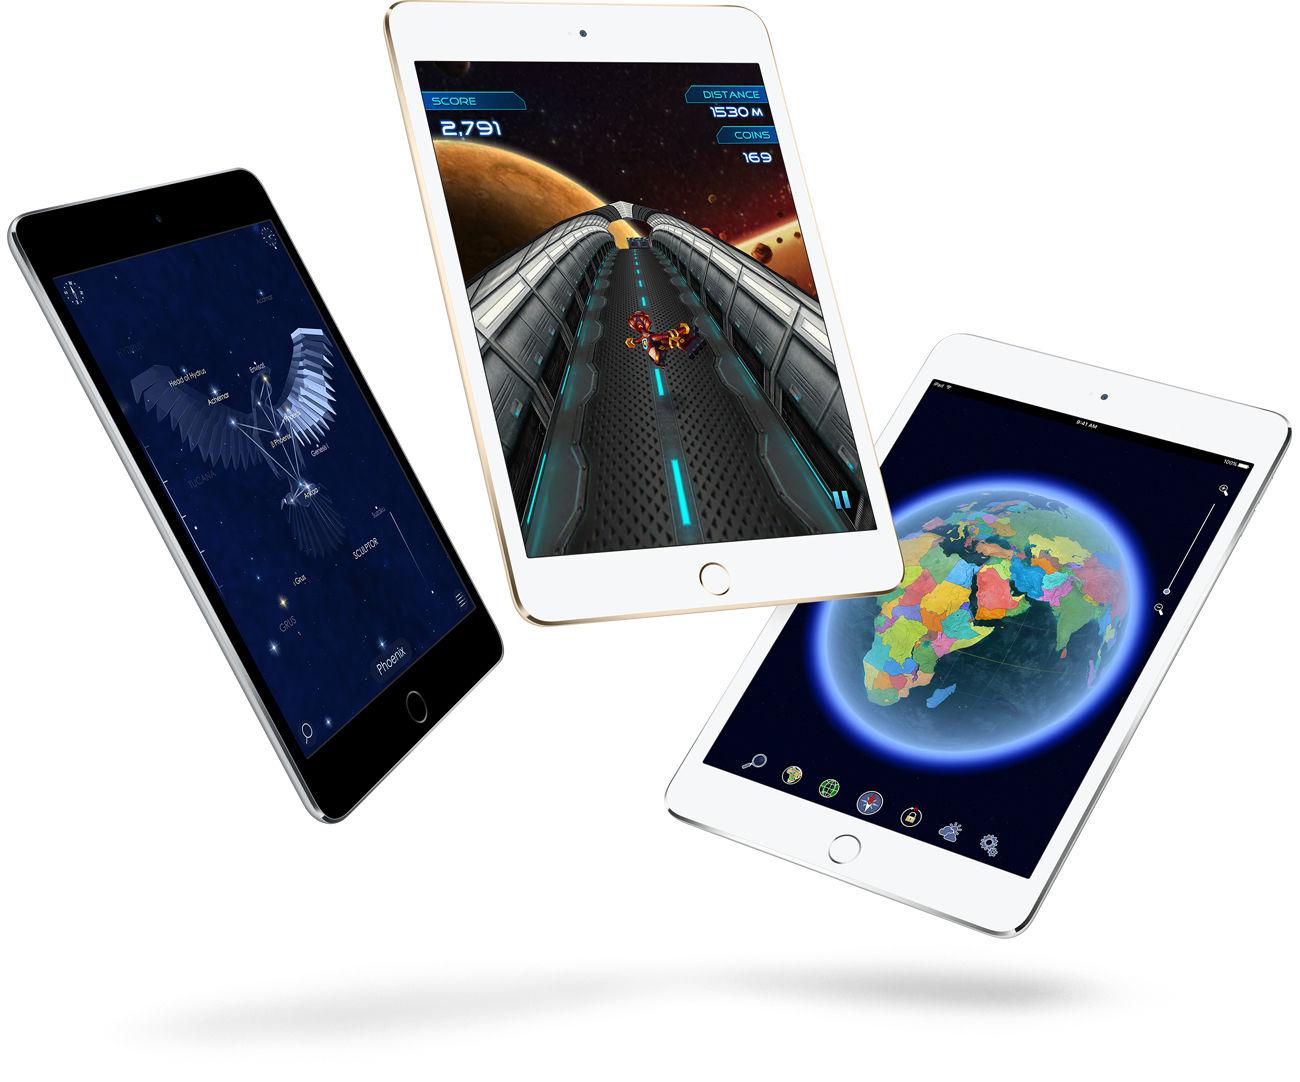 new_web/1445872229186-29761929_8410.jpg